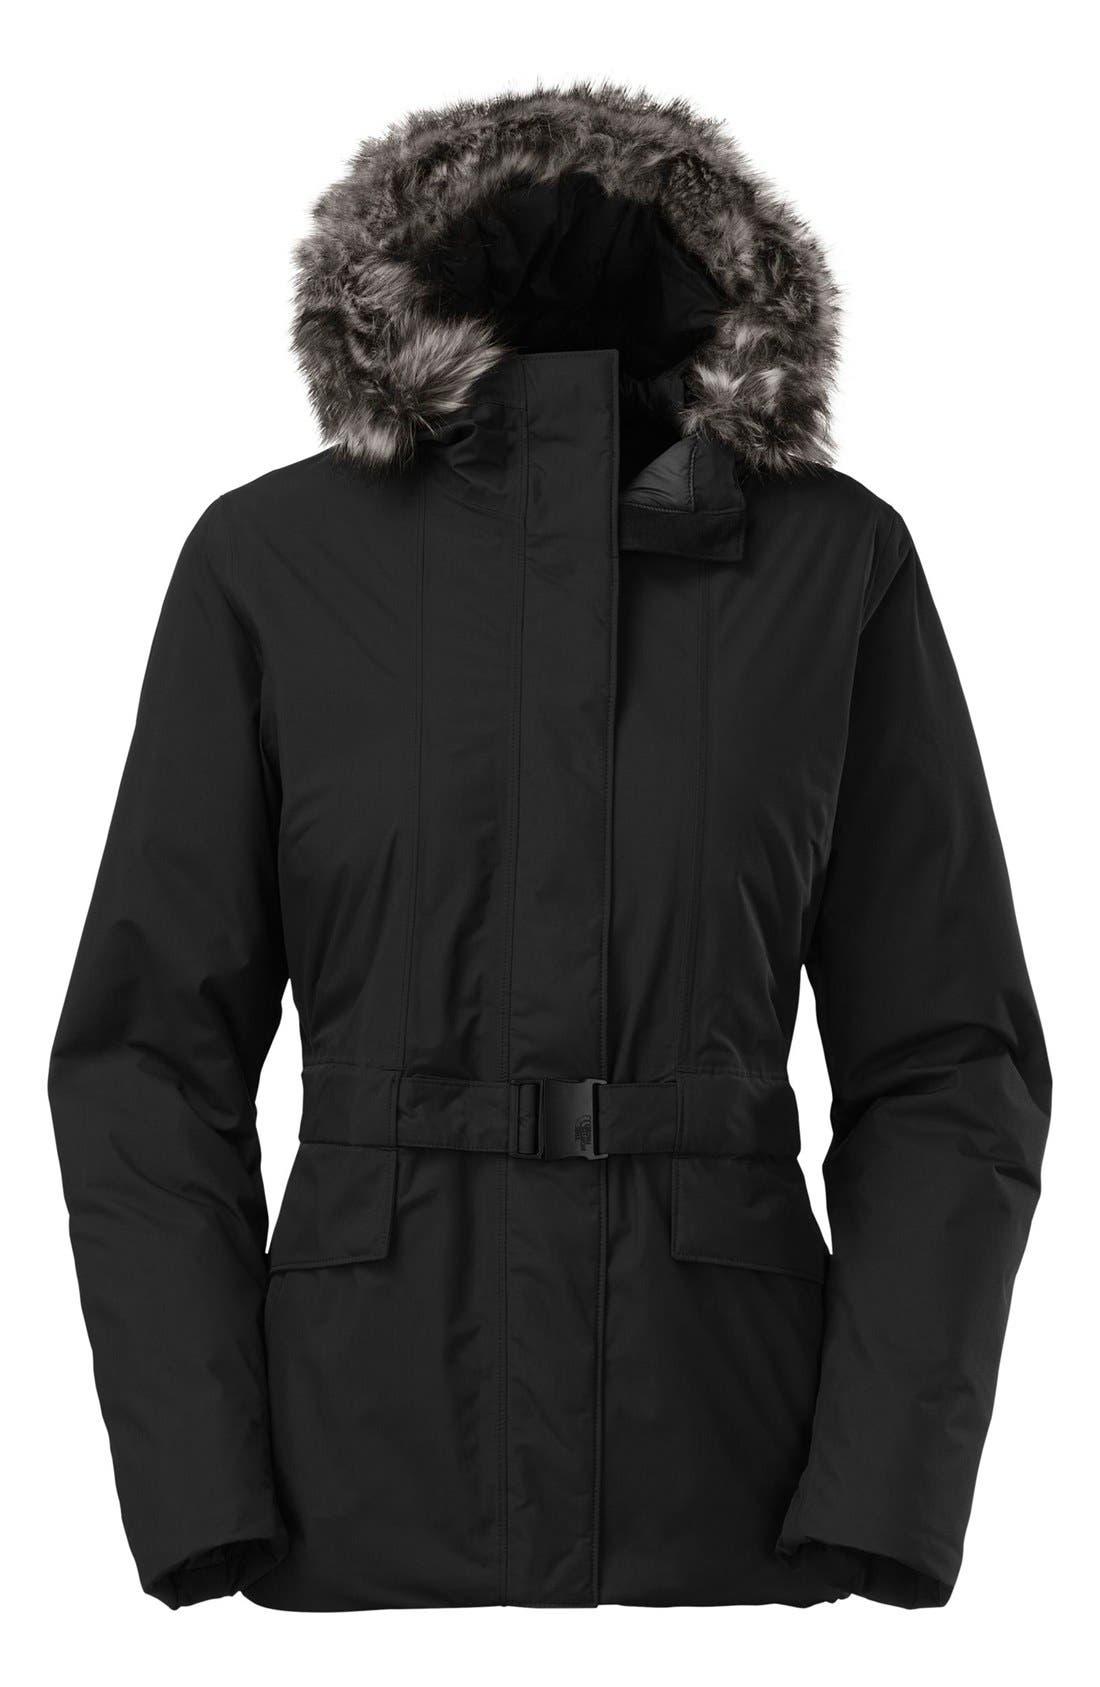 Main Image - The North Face 'Dunagiri' Waterproof Down Parka with Faux Fur Trim